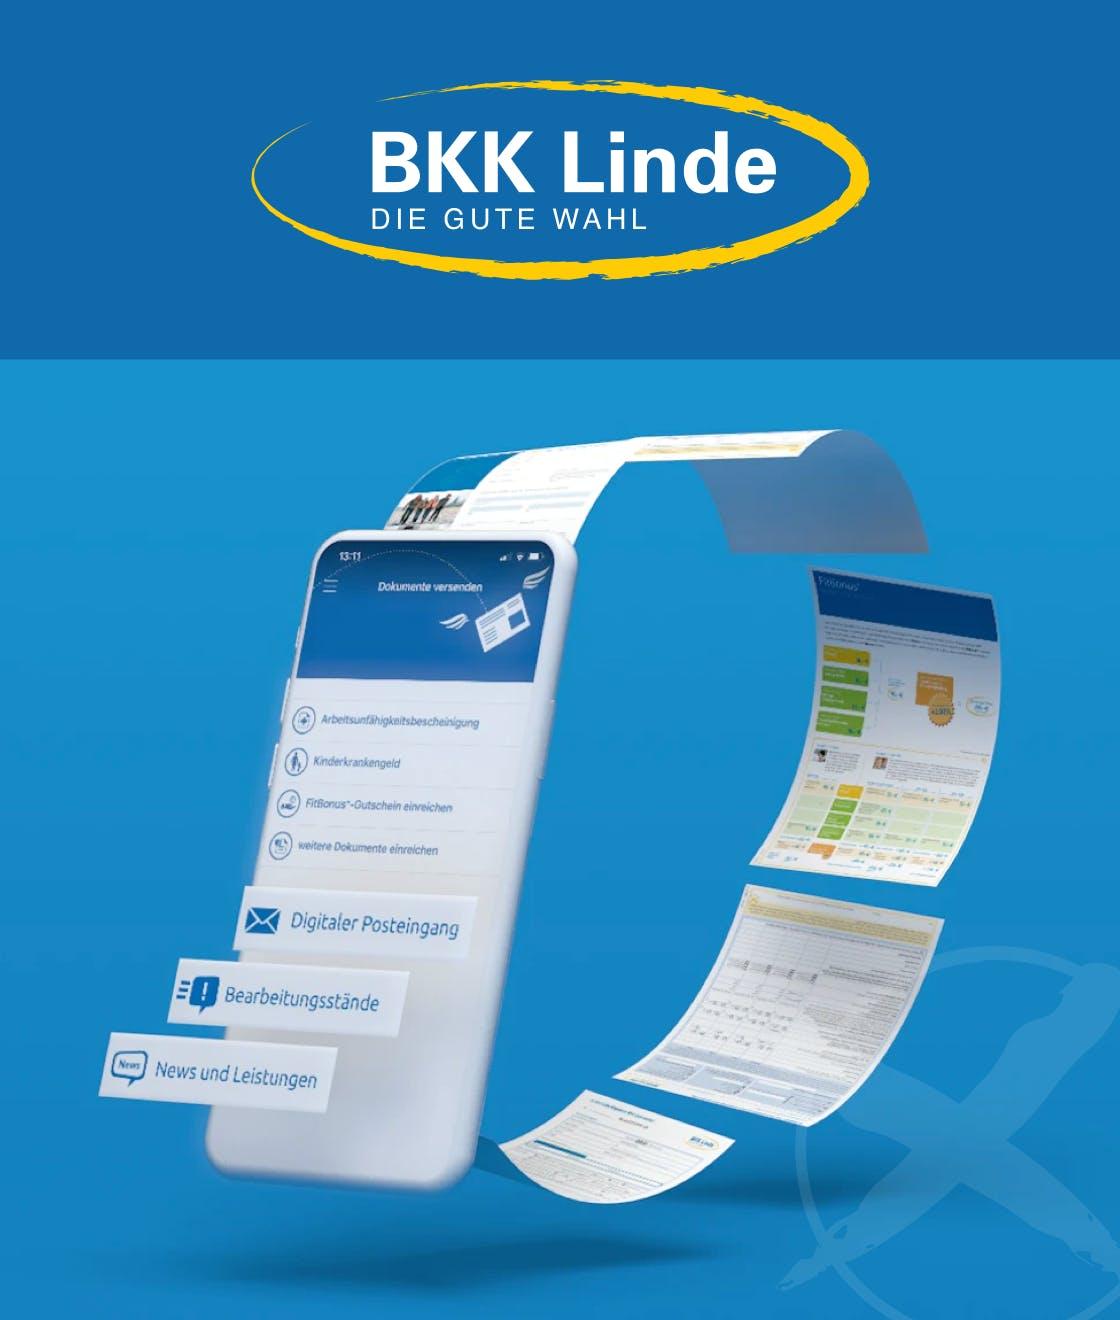 BKK Linde